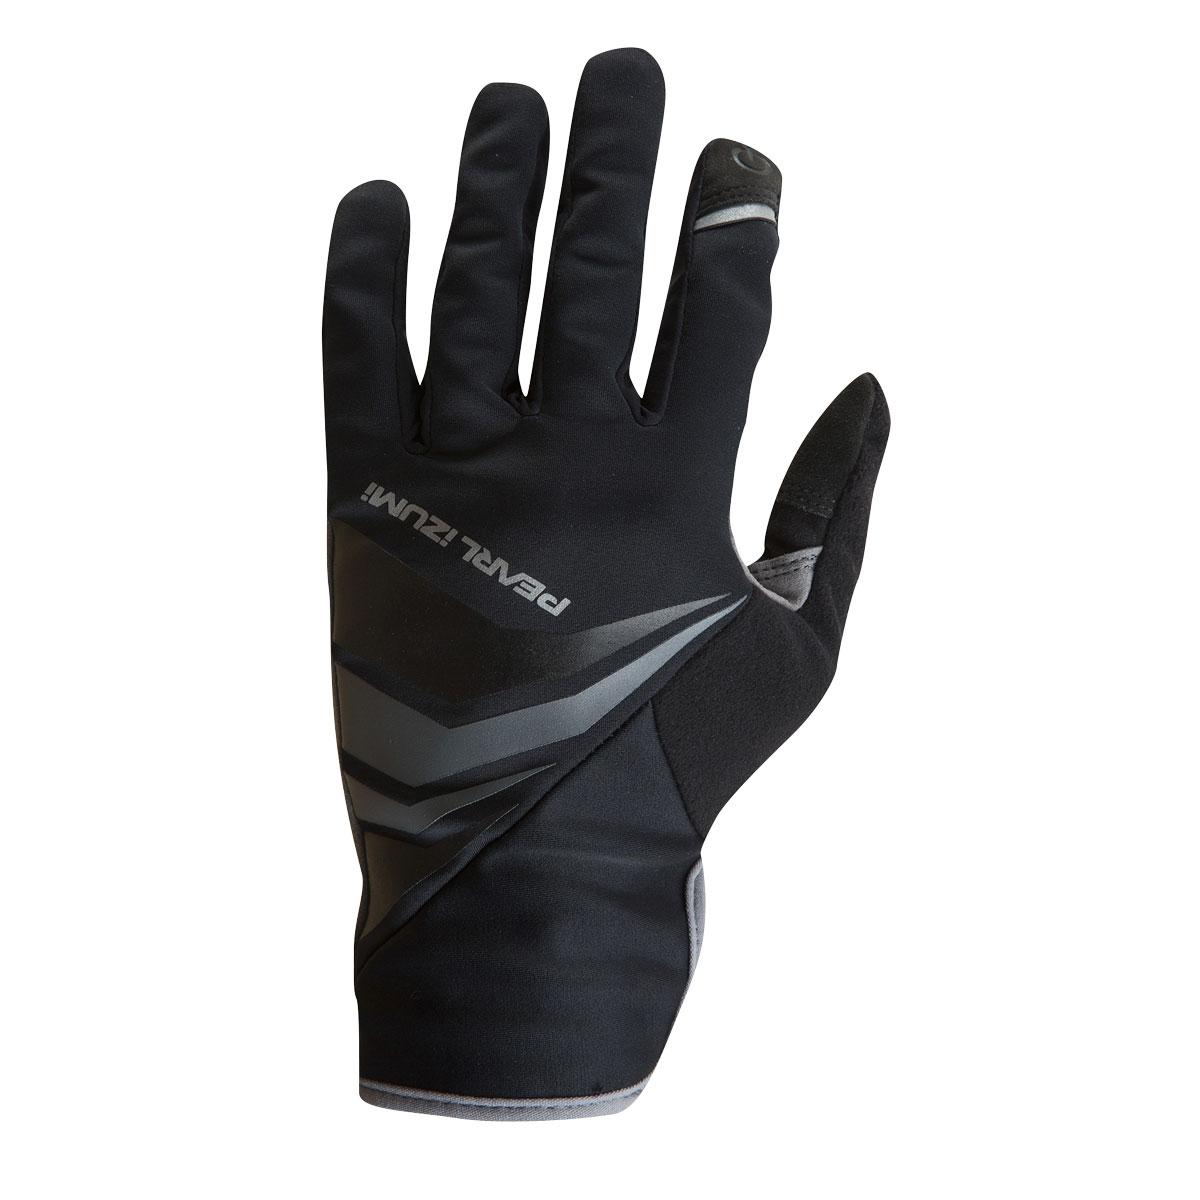 PEARL iZUMi CYCLONE GEL rukavice, černá, L